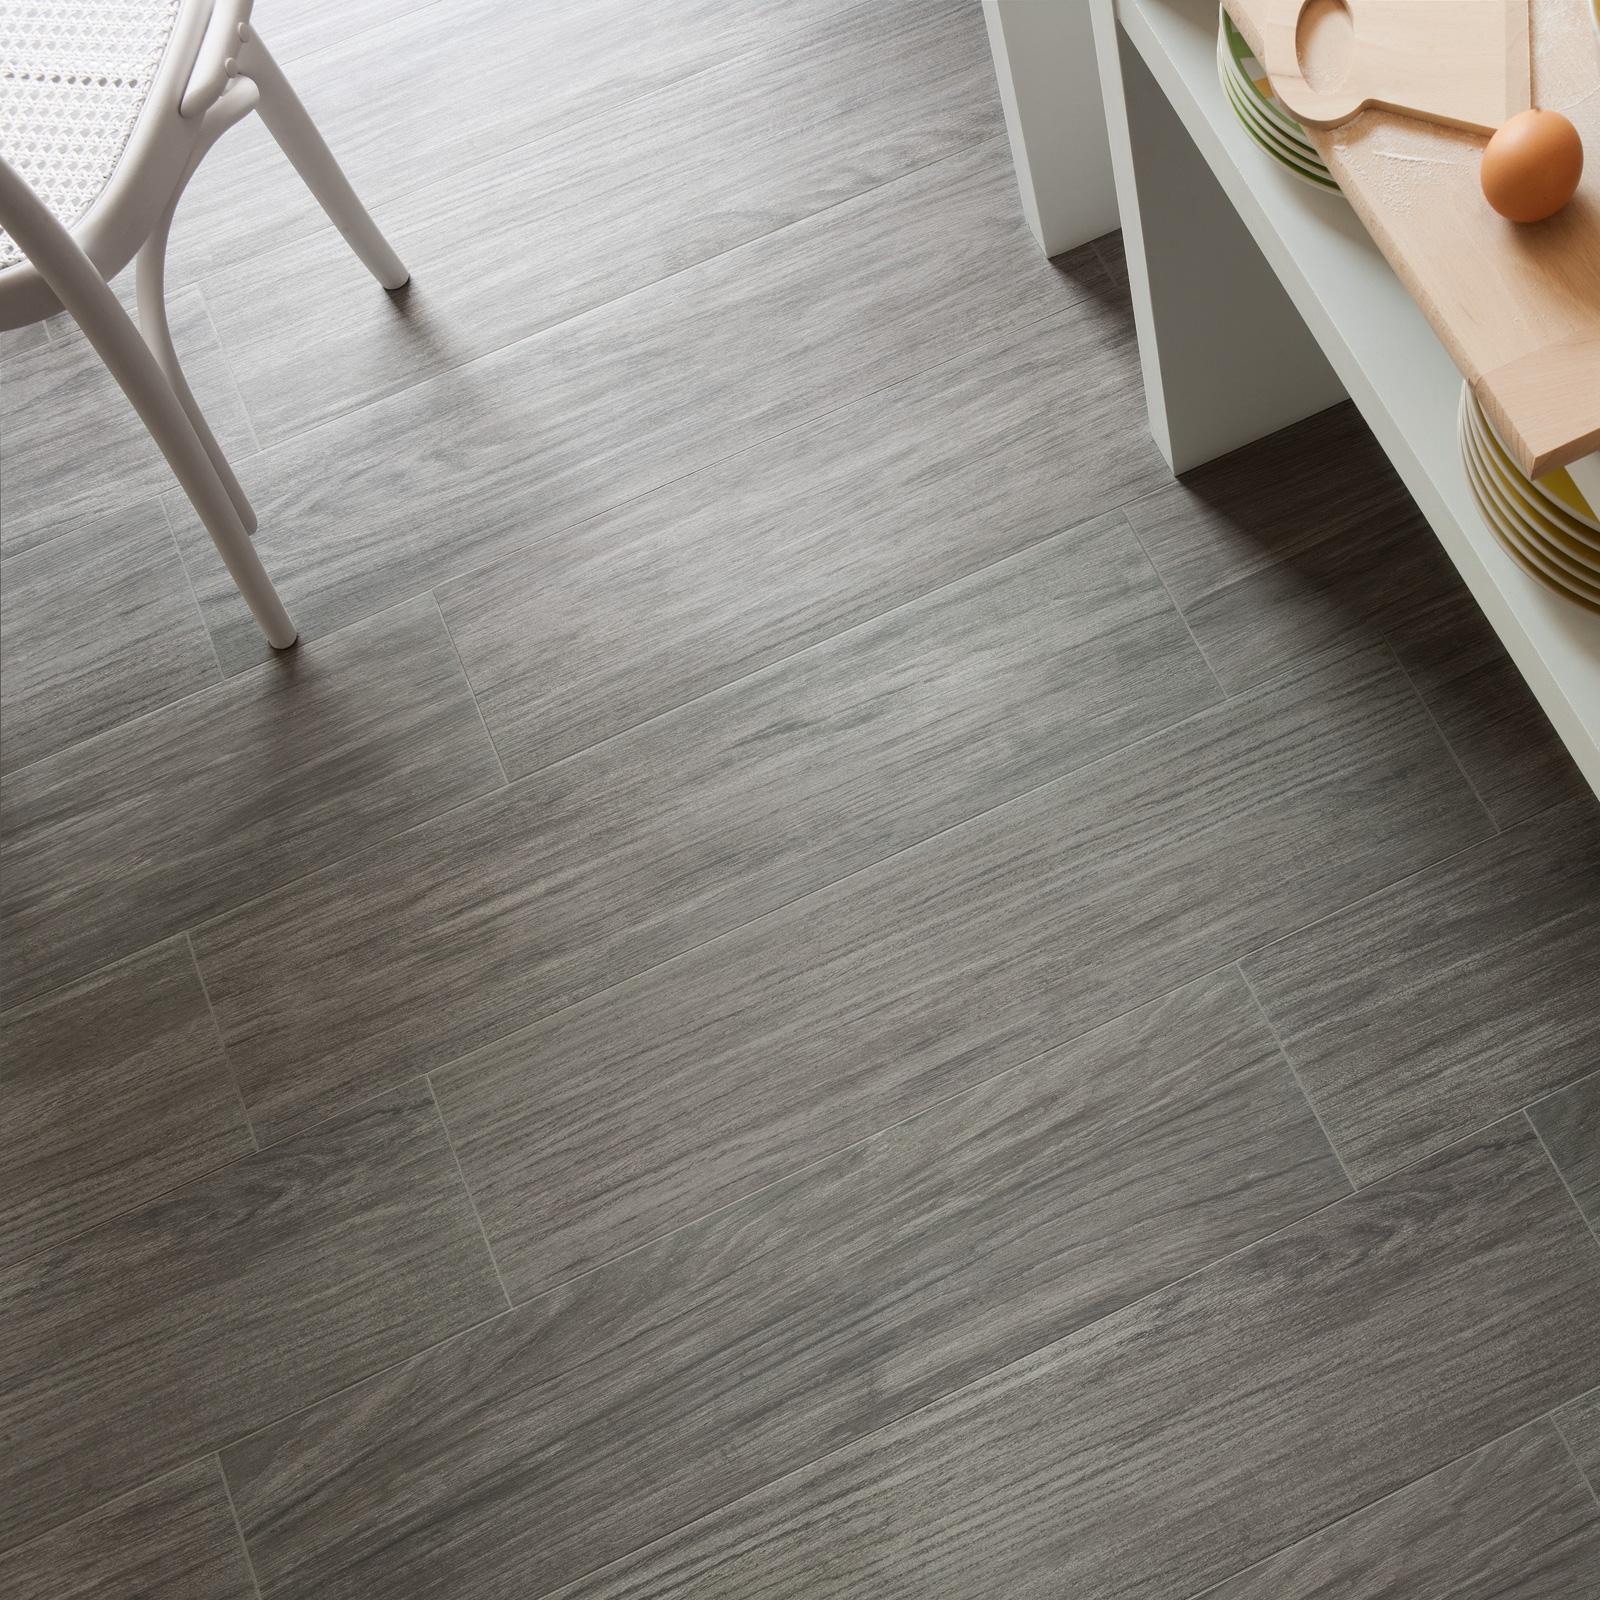 Bathroom Floor Tile Effect : Cortina falzarego wood effect floor tile